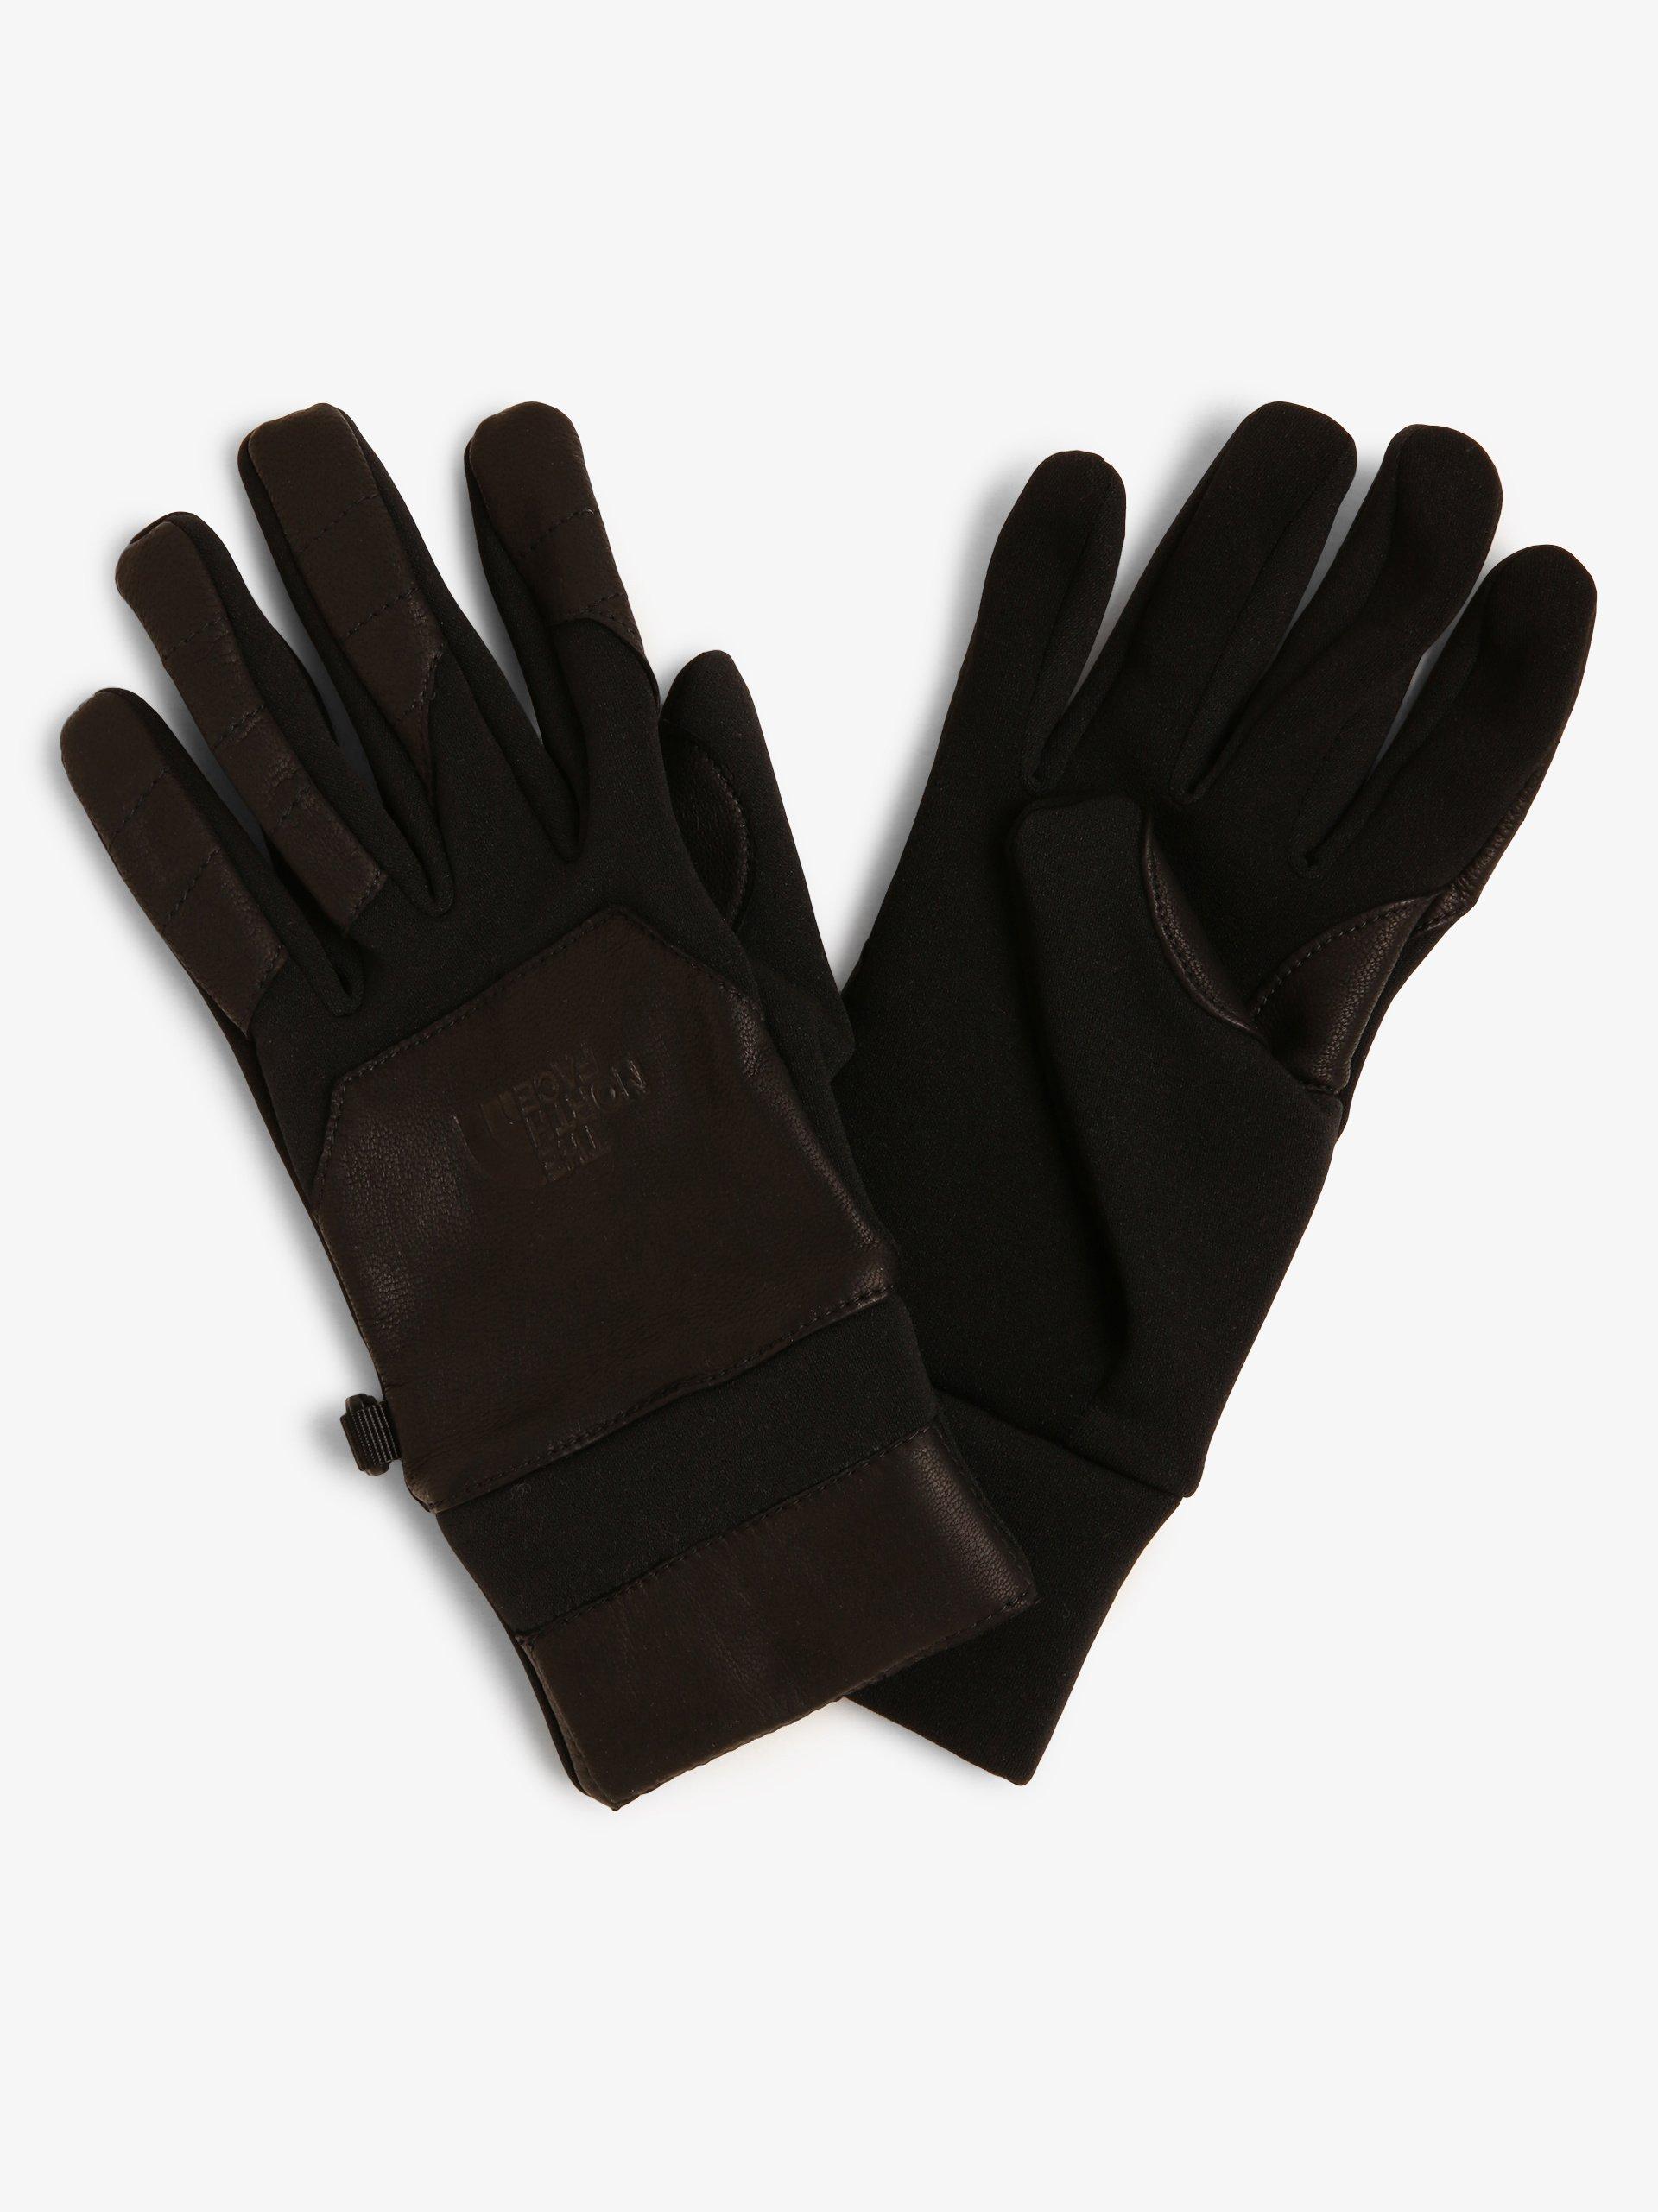 The North Face Herren Handschuhe mit Leder-Anteil